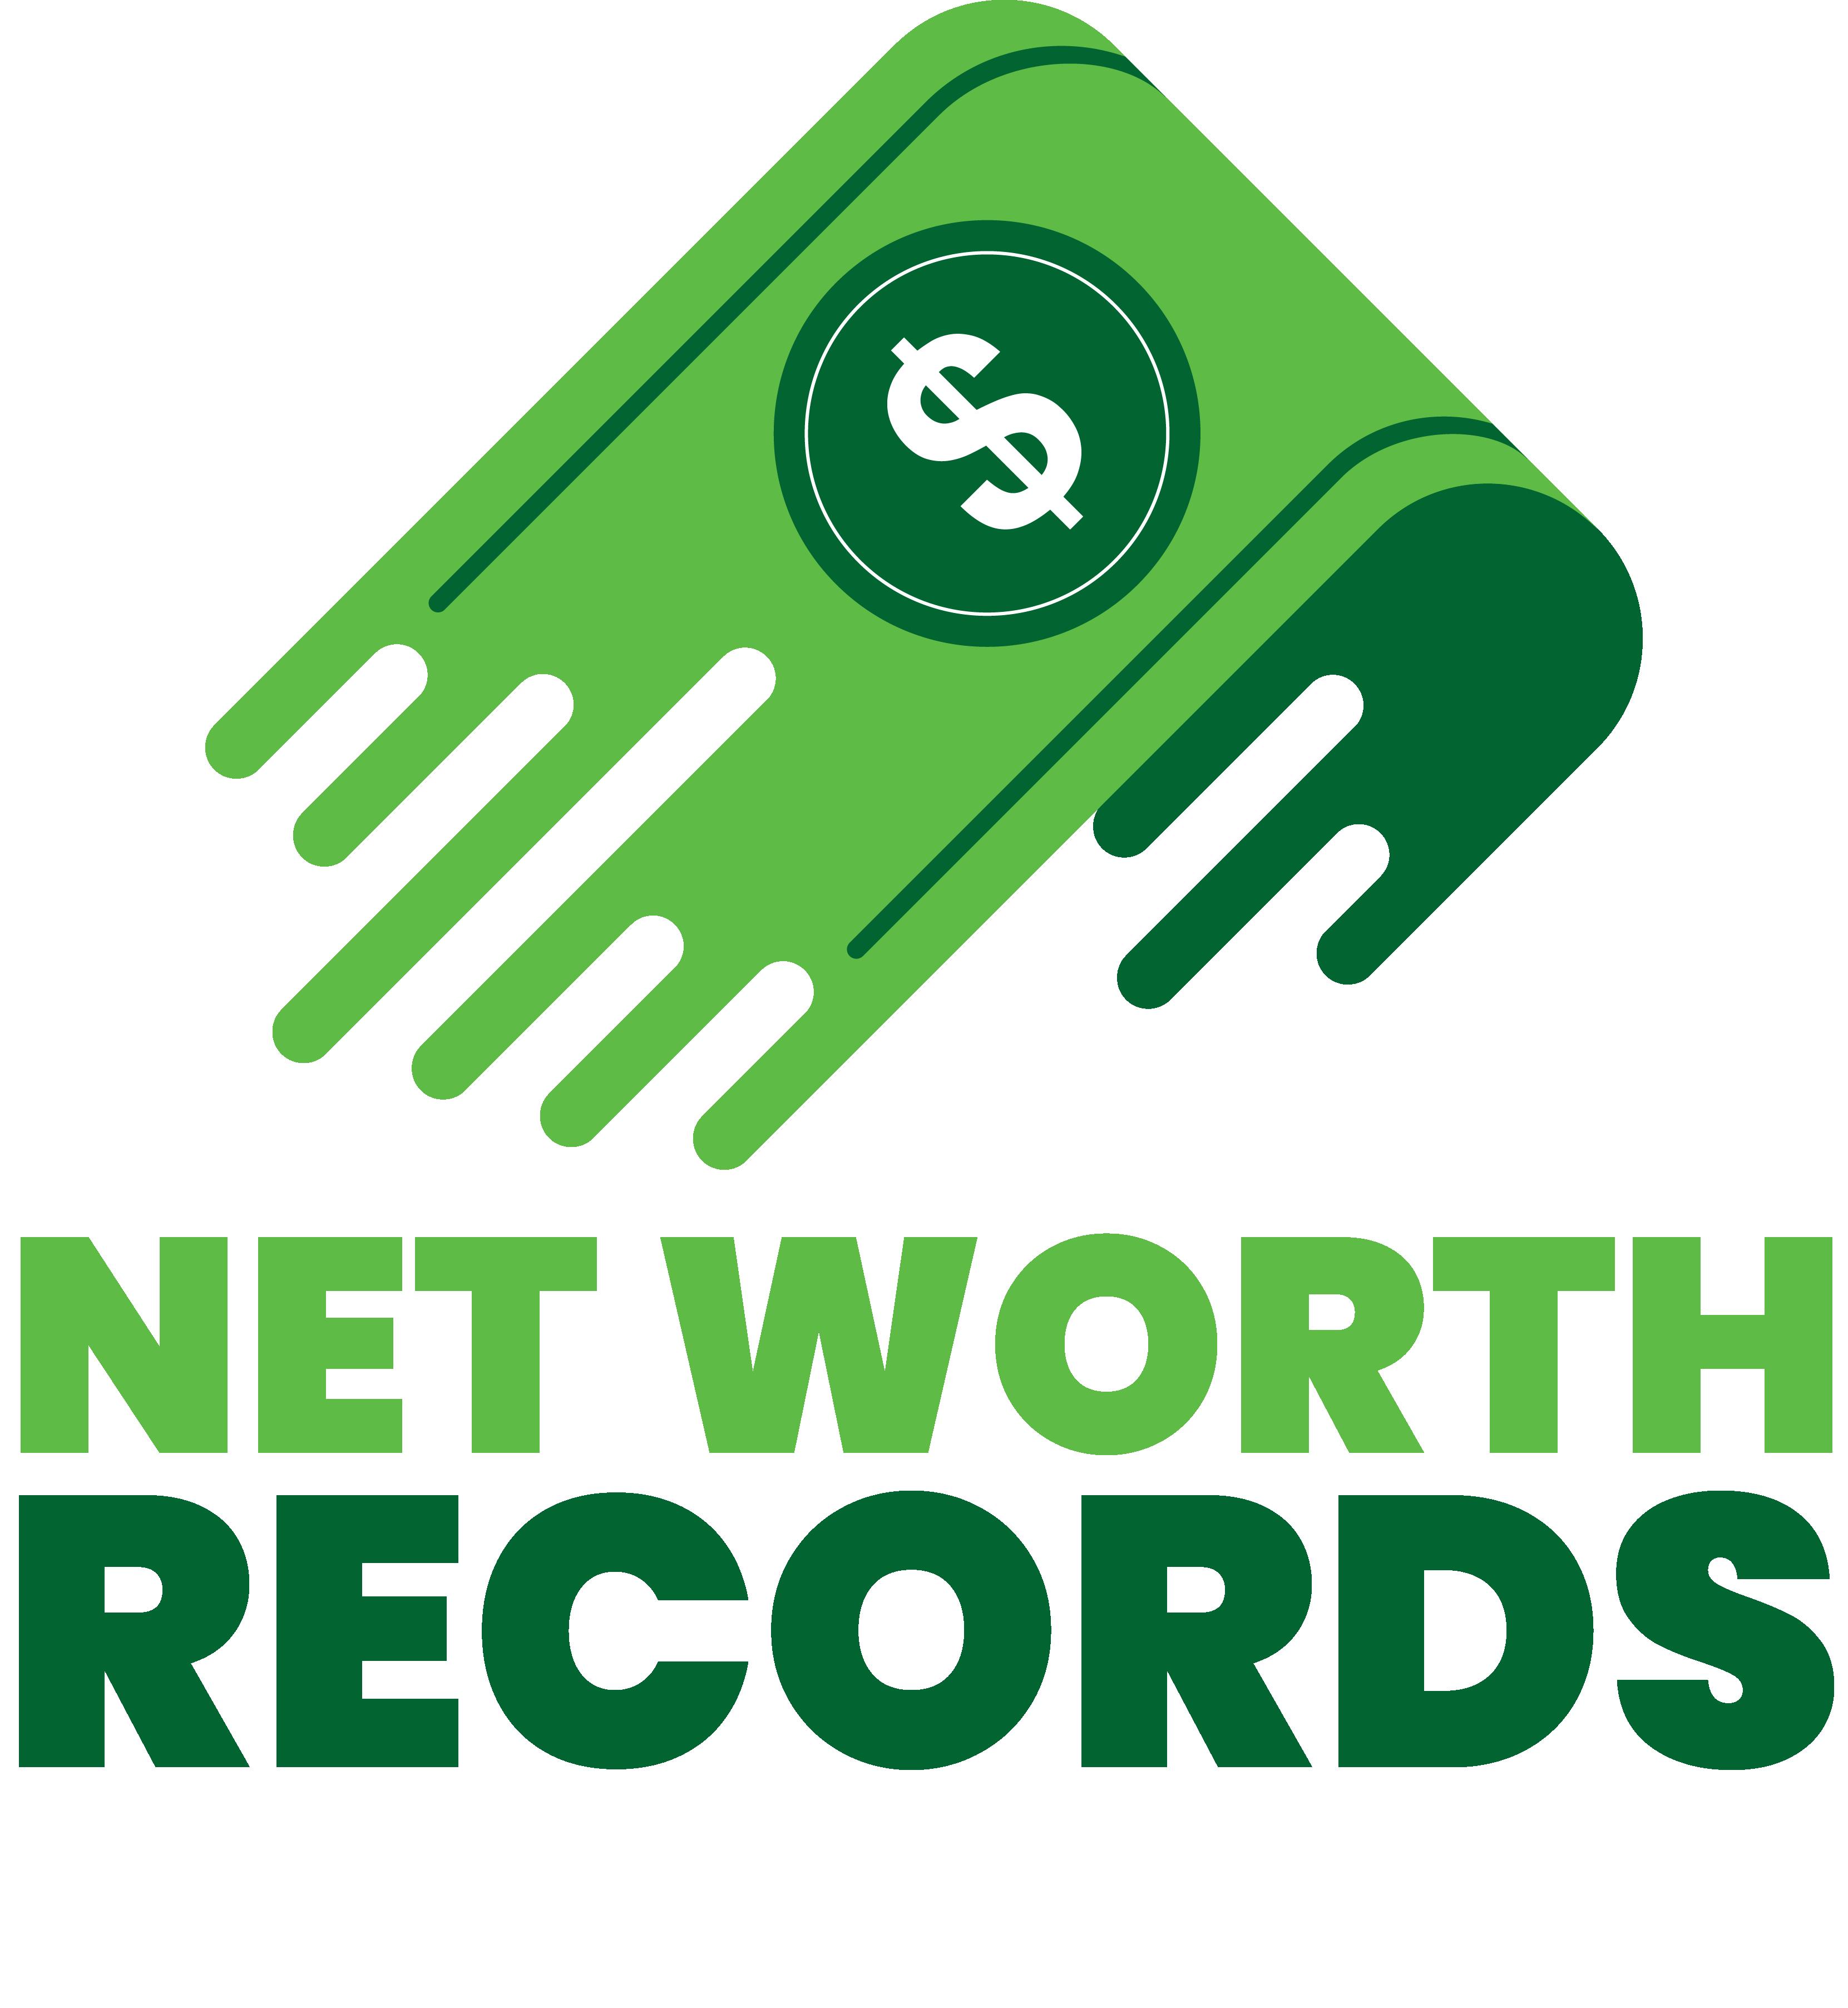 Net Worth Records